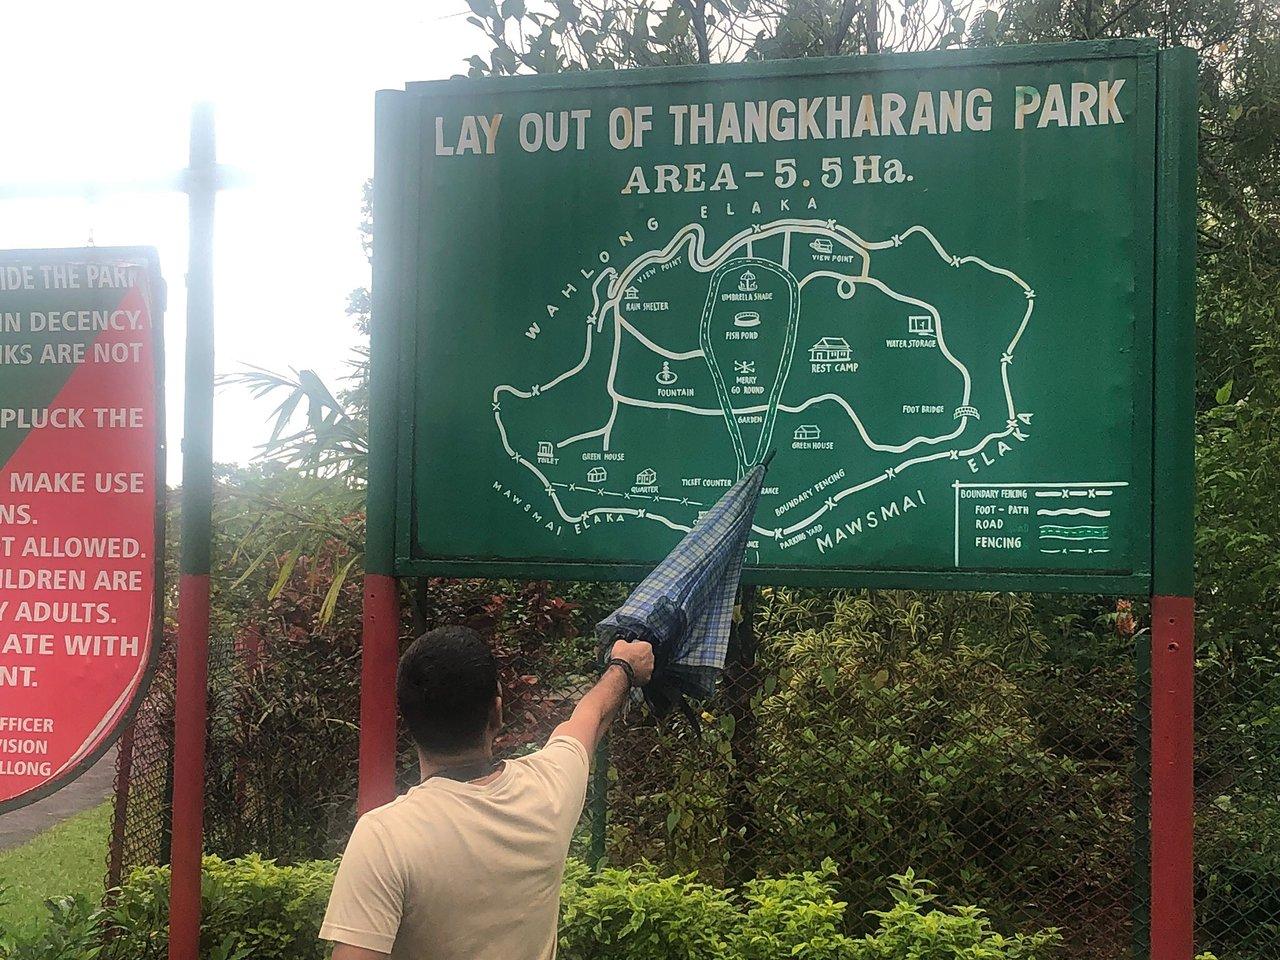 Sightseeing Place to Visit In Cherrapunji-Thangkharang Park